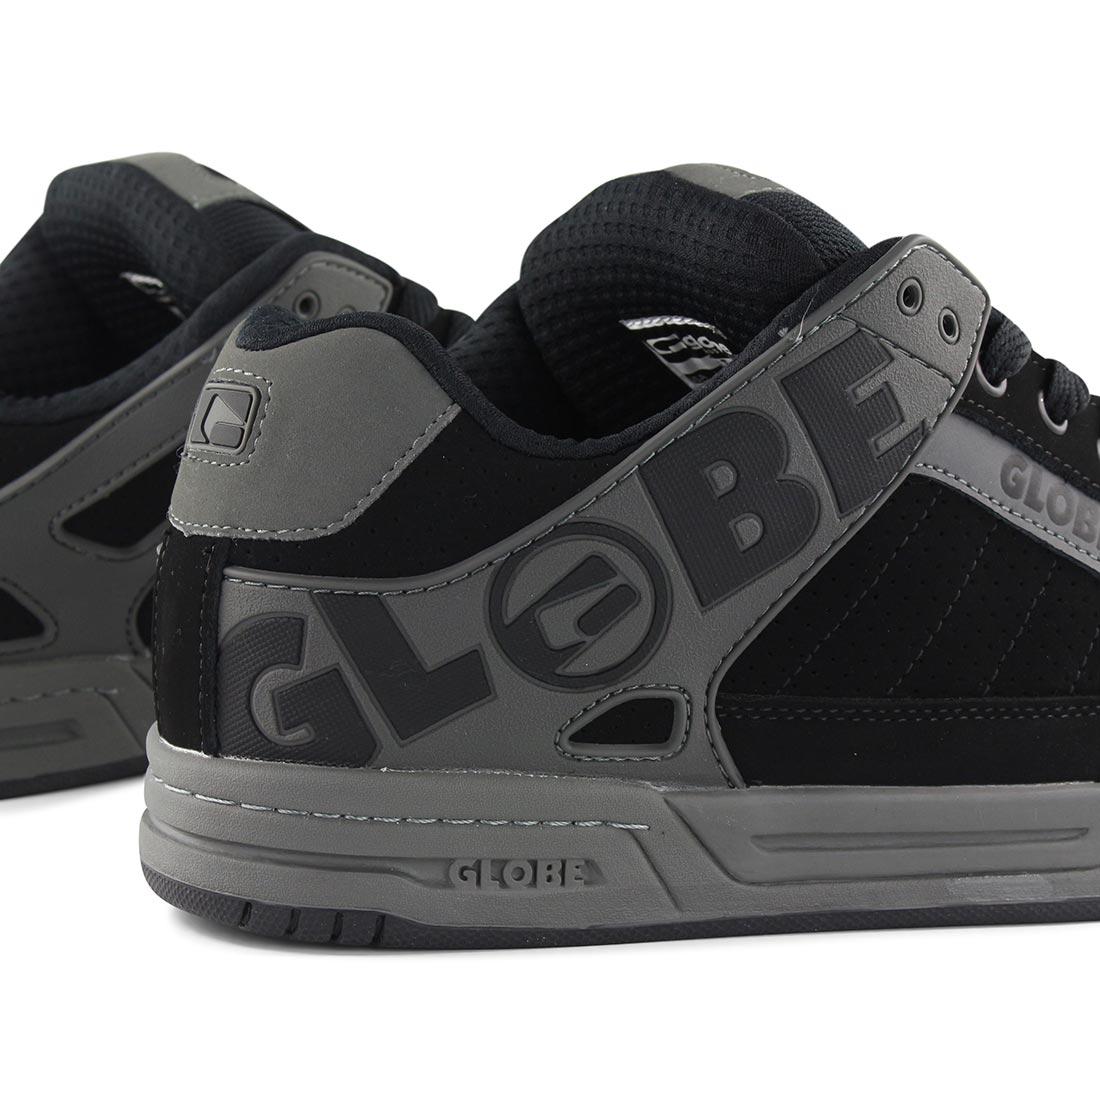 ee9a0ae245c3 ... Globe-Tilt-Shoes-Black-Charcoal- ...